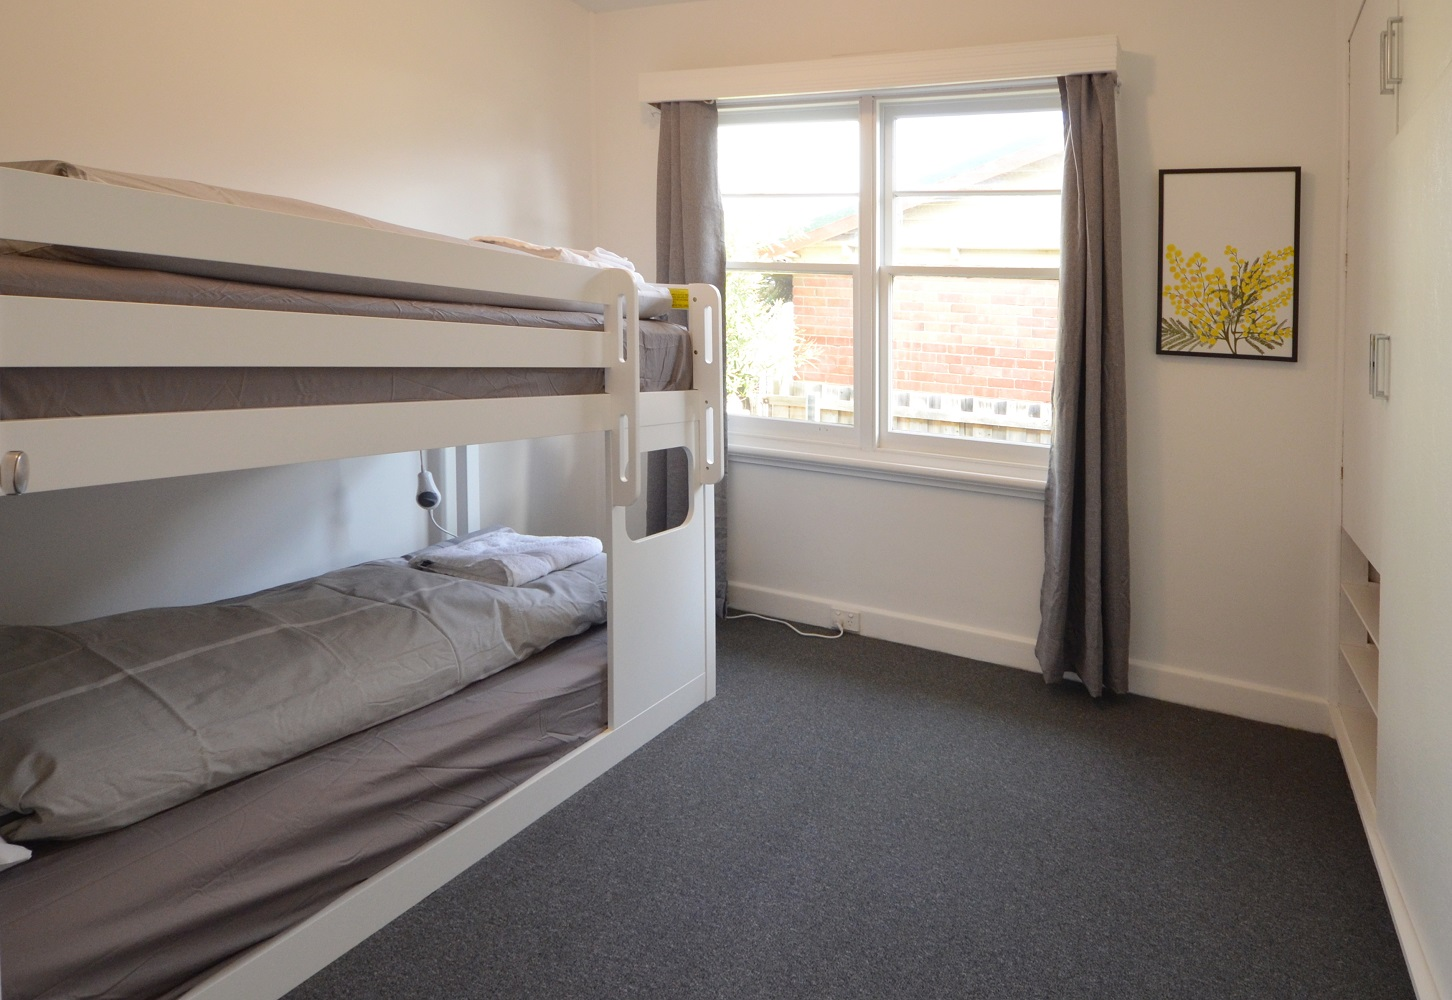 Kangaroo Bay Lodge, Bellerive, Self Contained Accommodation Hobart, Family Accommodation